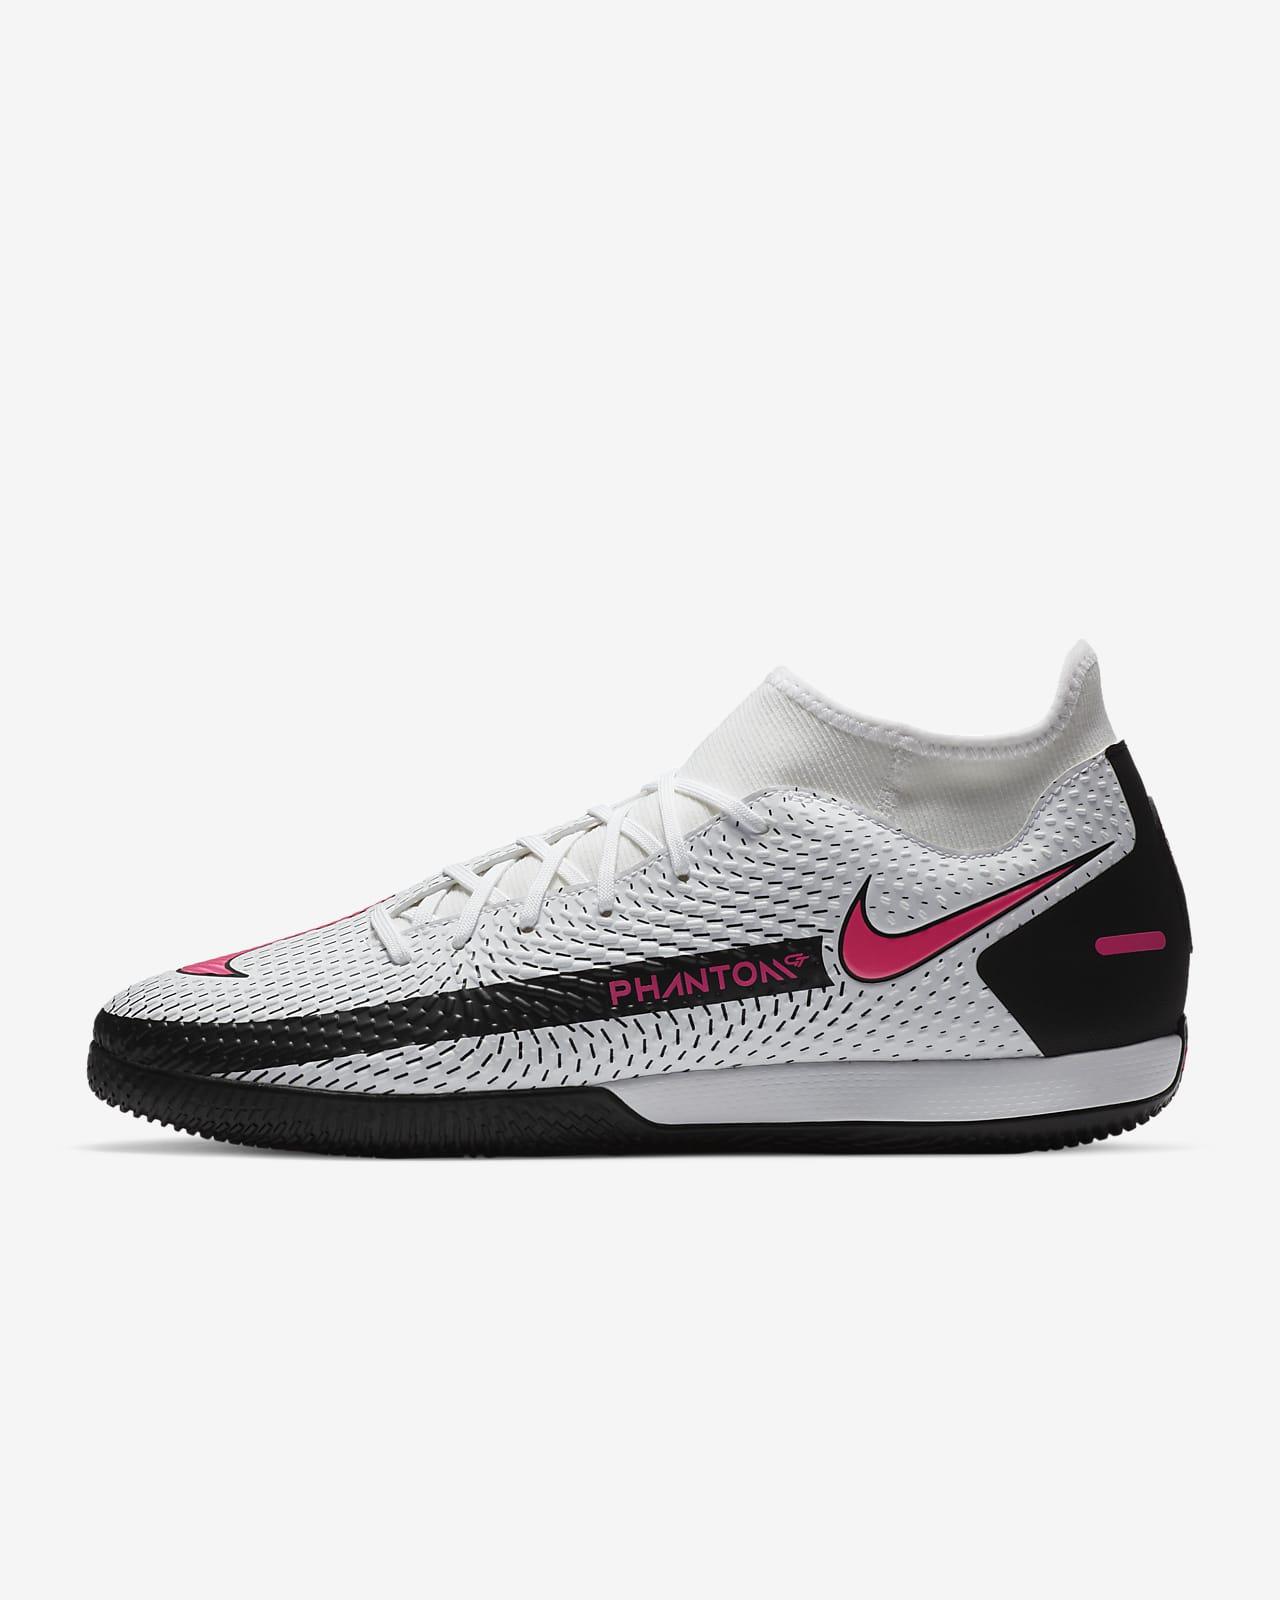 Nike Phantom GT Academy Dynamic Fit IC Indoor Court Football Shoe